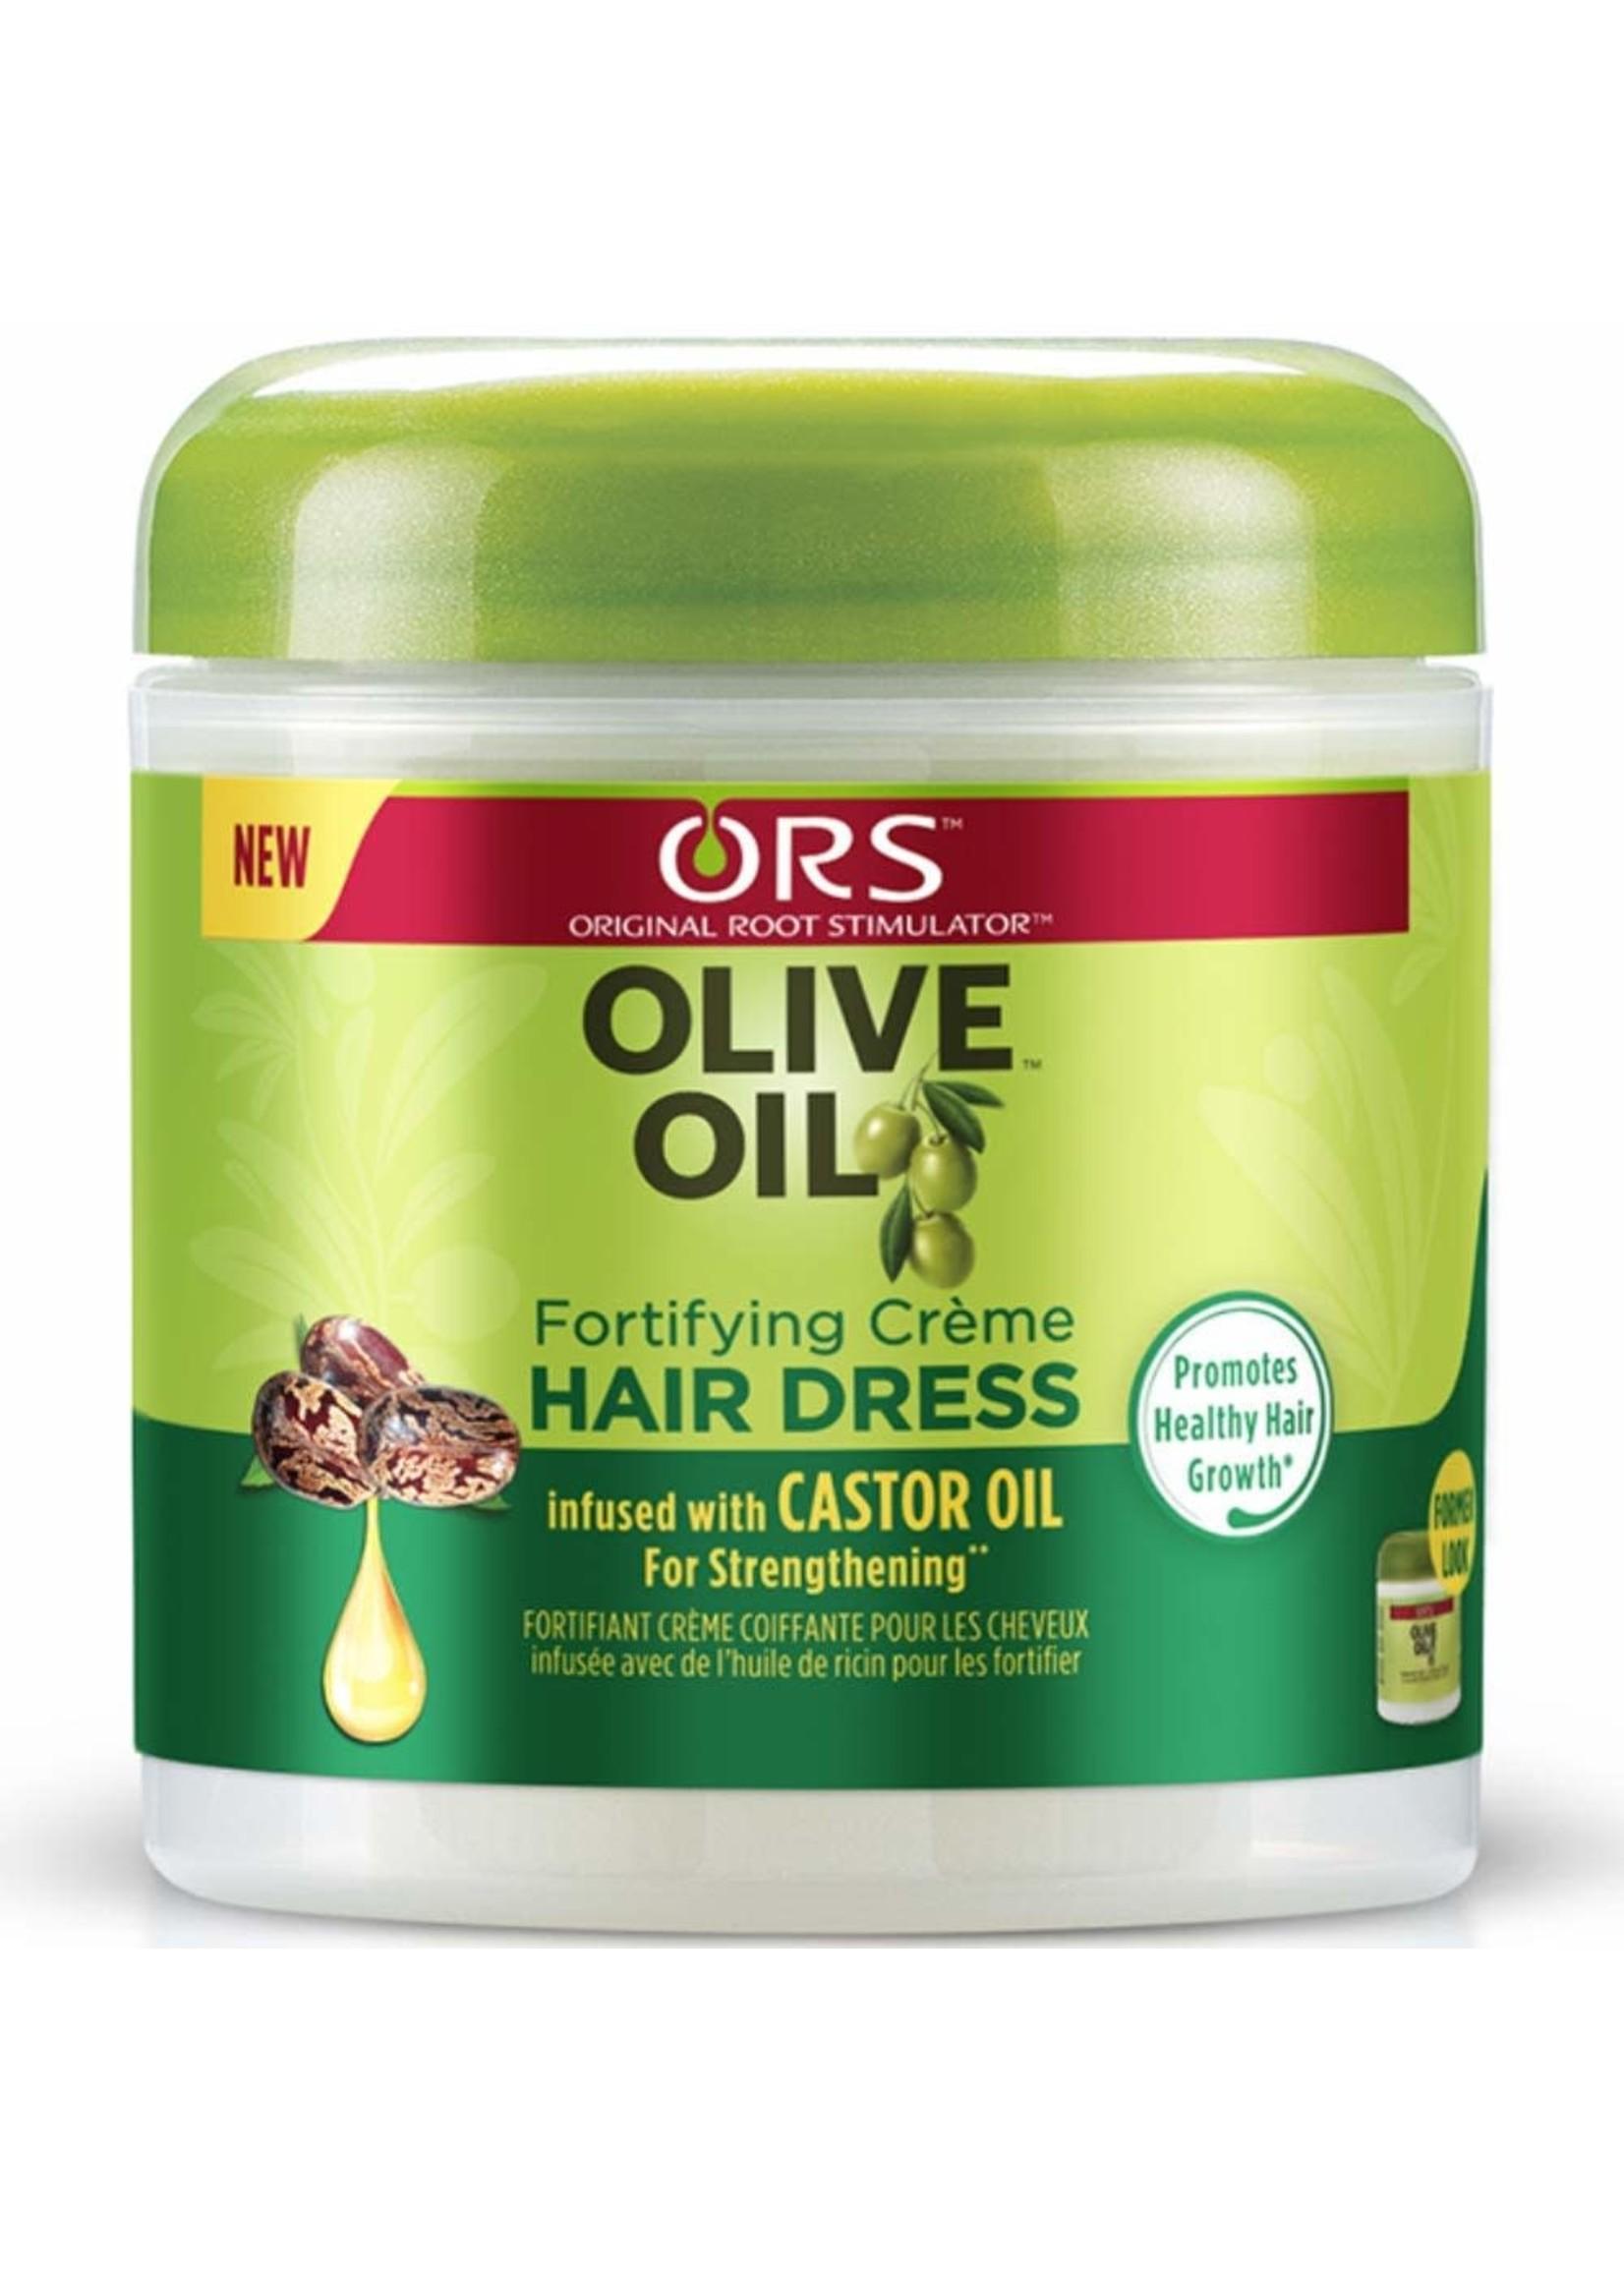 ORS Fortifying Creme Hair Dress